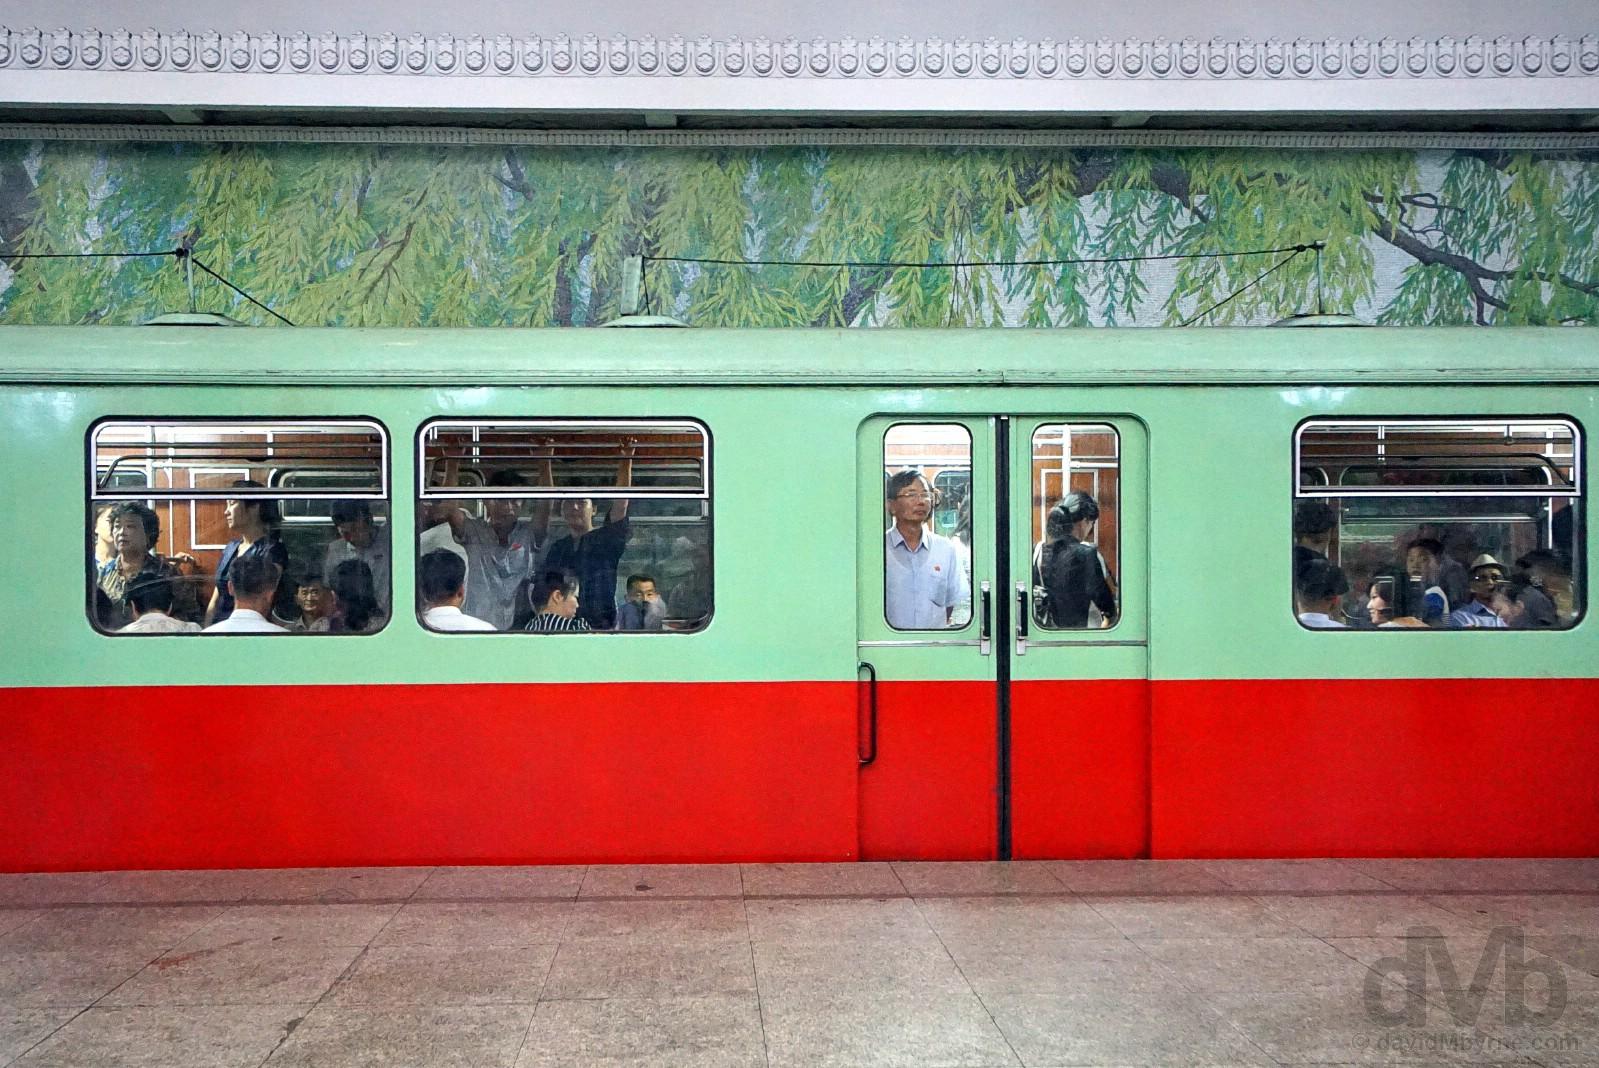 Metro, Pyongyang, North Korea. August 15, 2017.